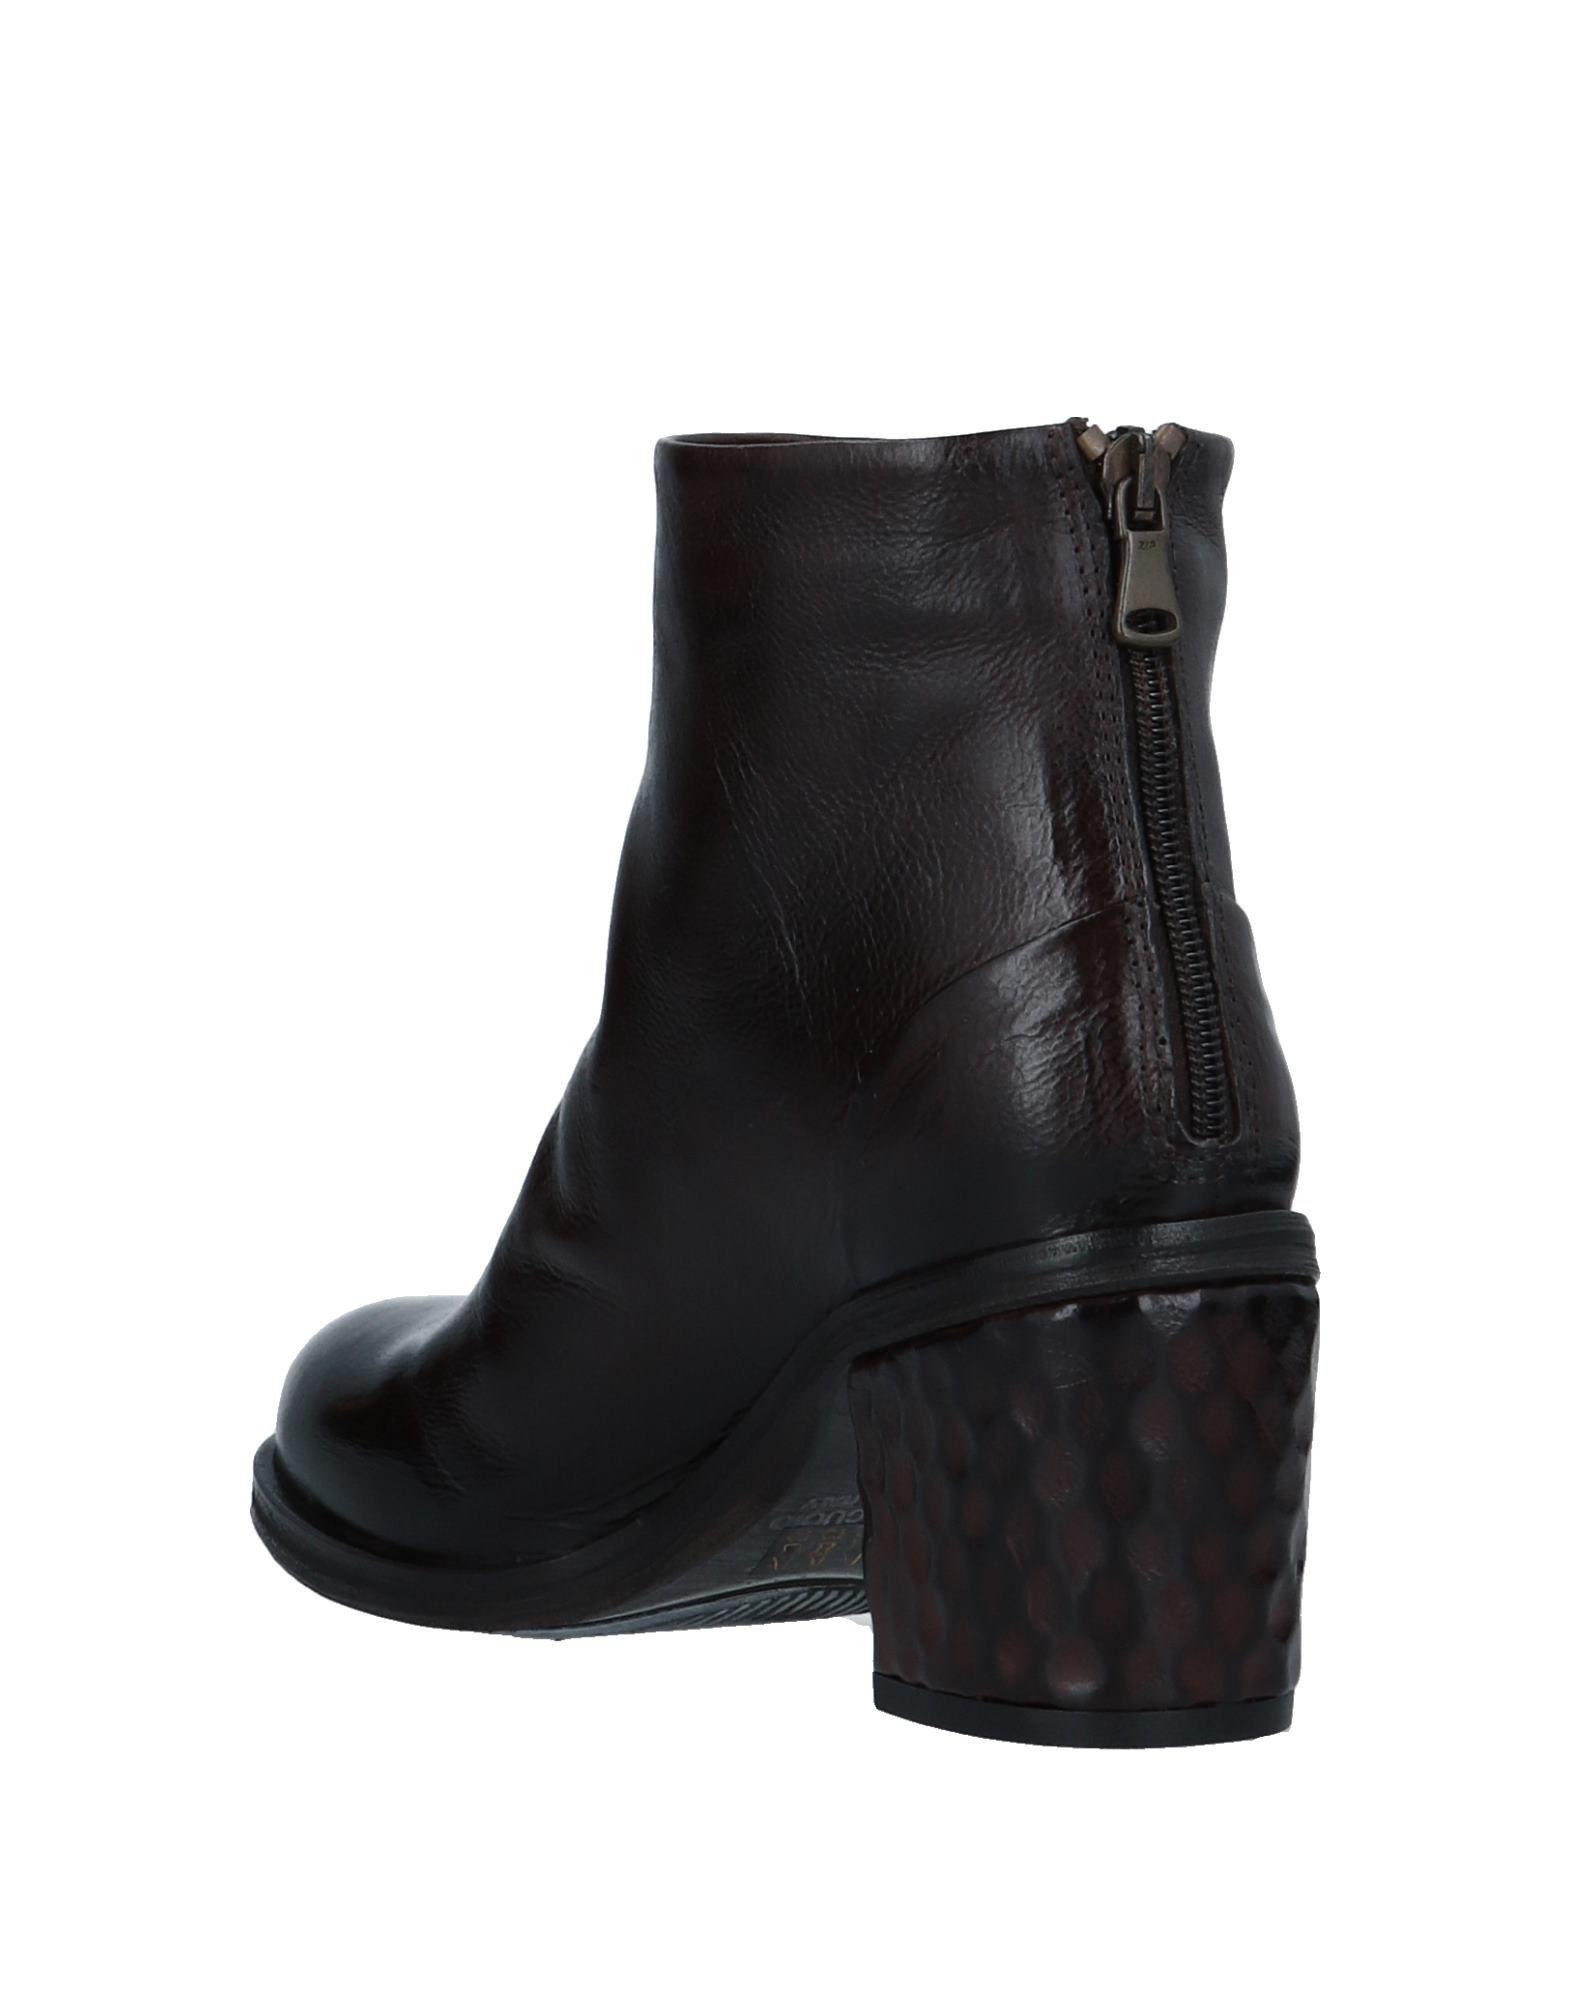 Stilvolle billige Schuhe  Kbr Schuhes Stiefelette Damen  Schuhe 11519493TK fcb67e